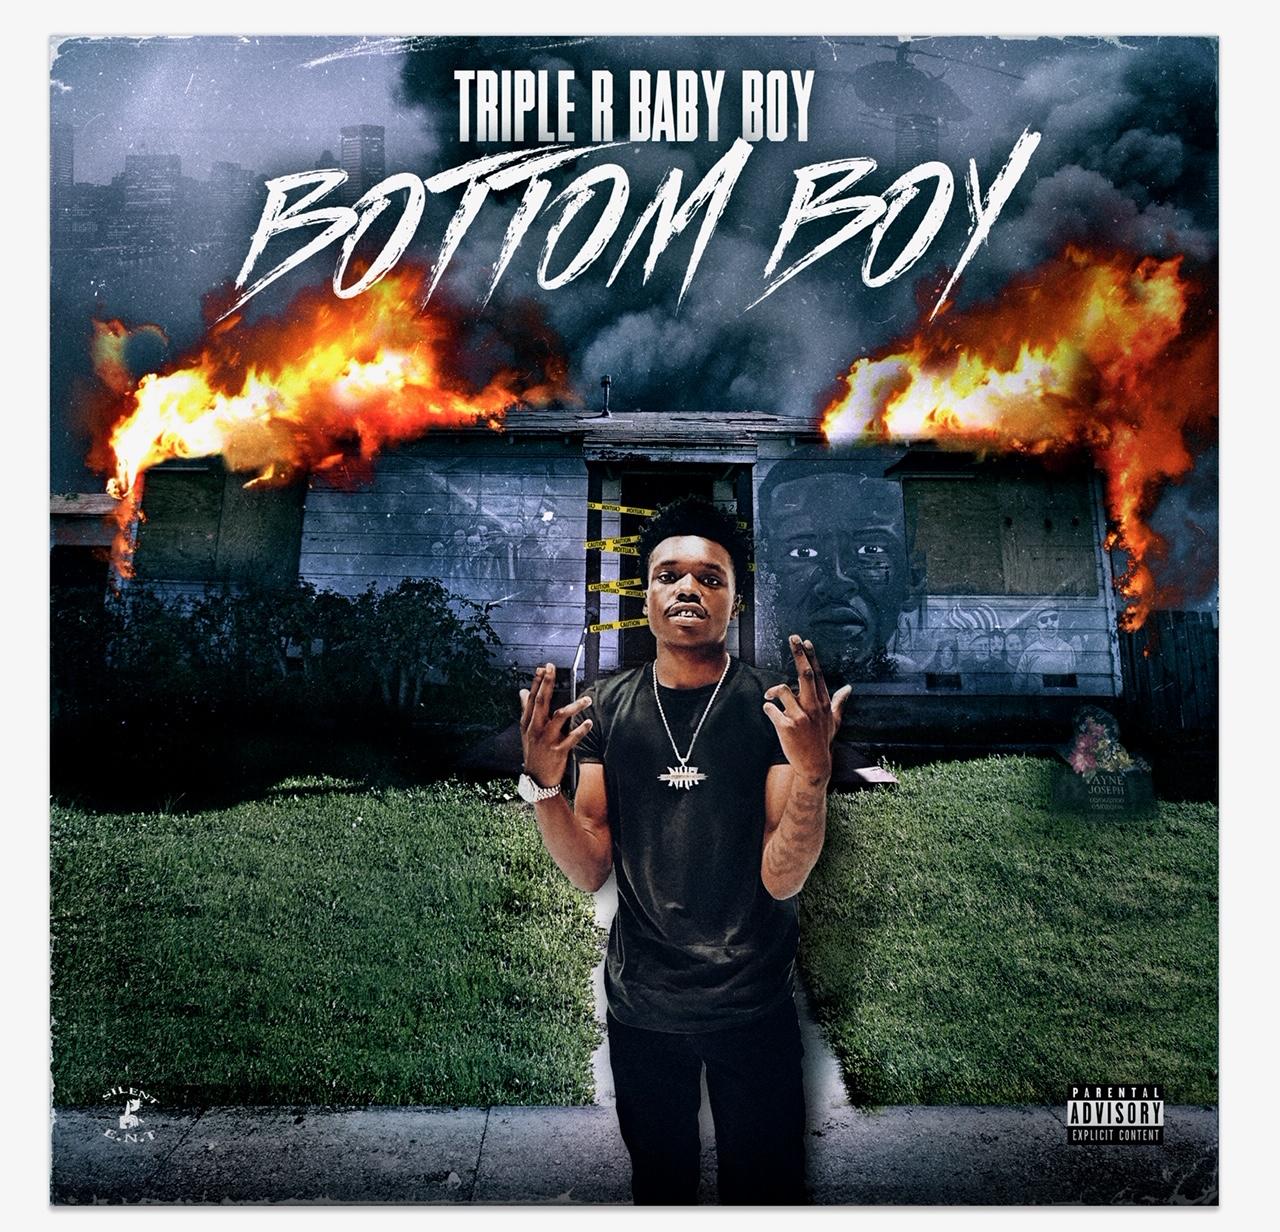 Maryland's Triple R BabyBoy Makes Bold Debut 'Bottom Boy'